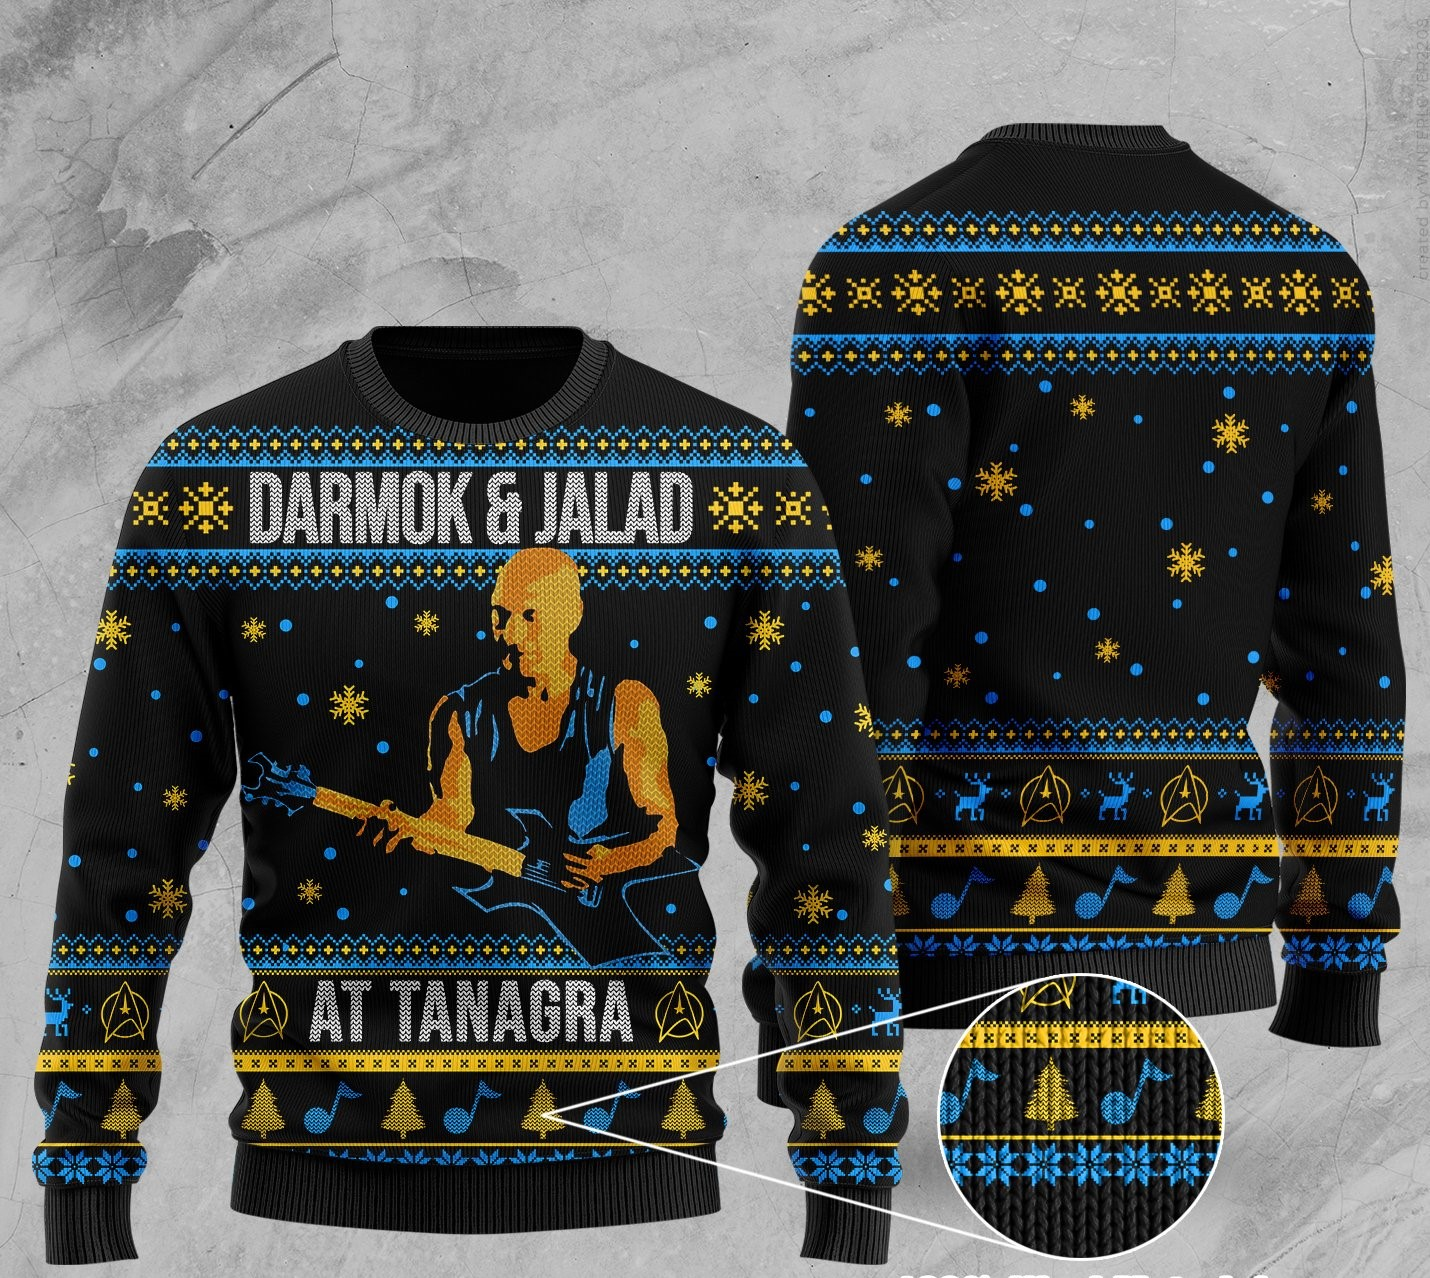 darmok and jalad at tanagra all over printed ugly christmas sweater 2